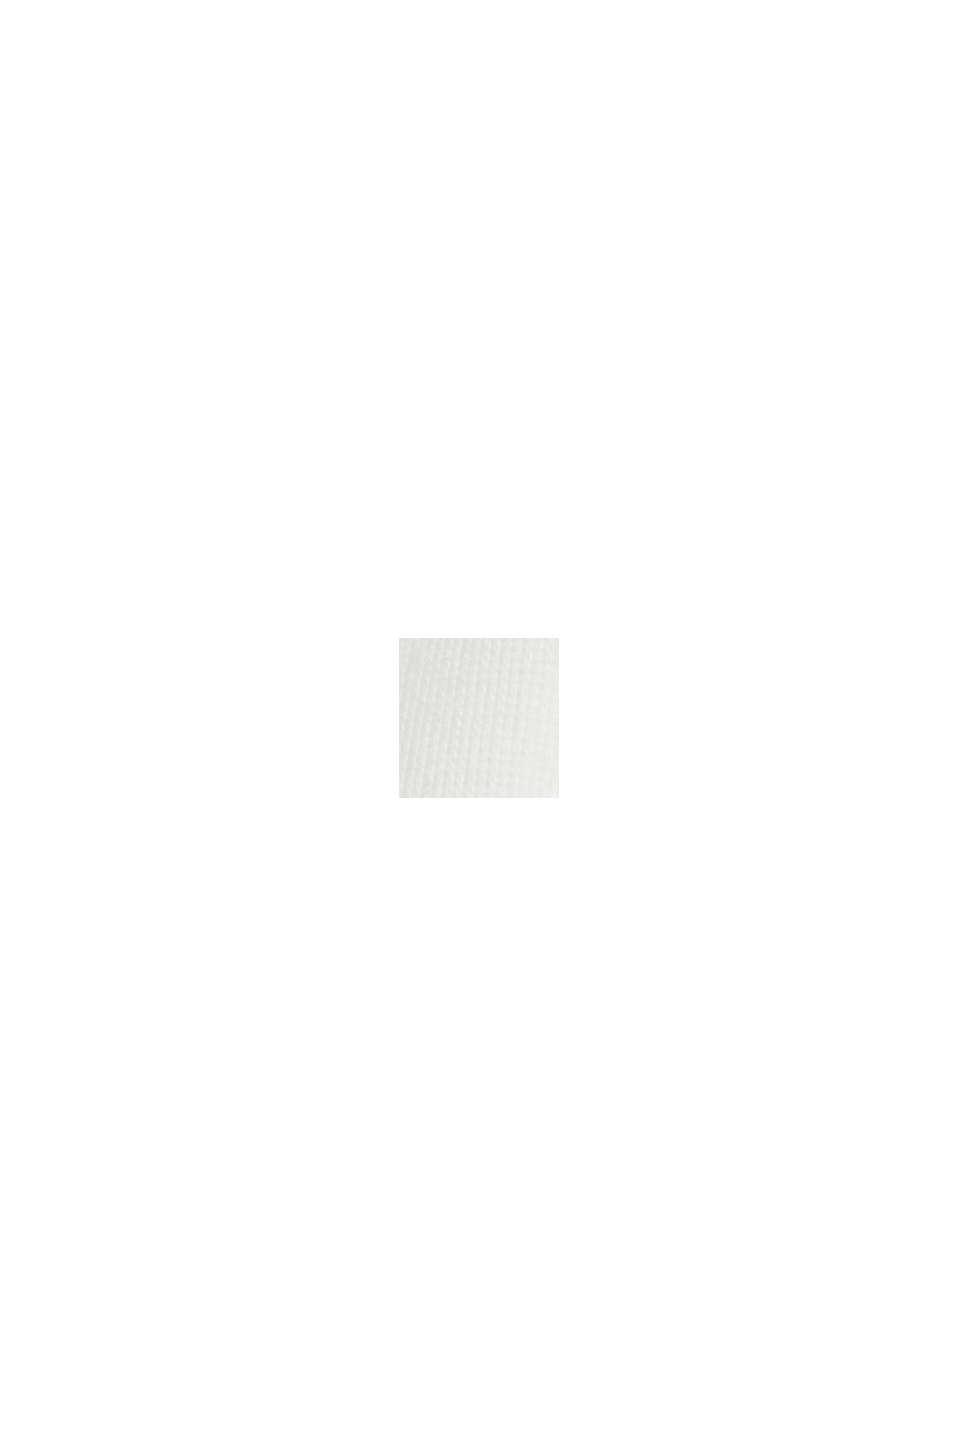 T-Shirt mit Schulterpolstern, LENZING™ ECOVERO™, OFF WHITE, swatch